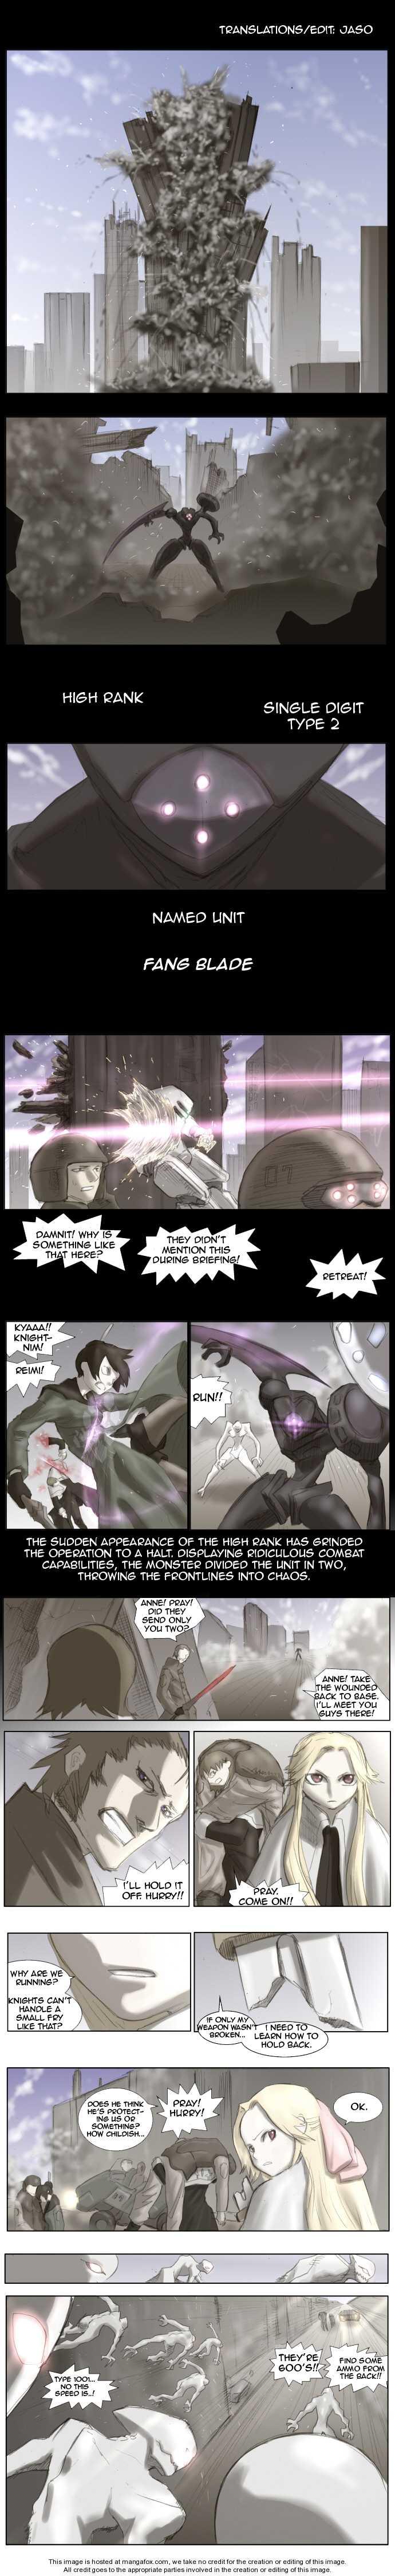 Knight Run 4 Page 1